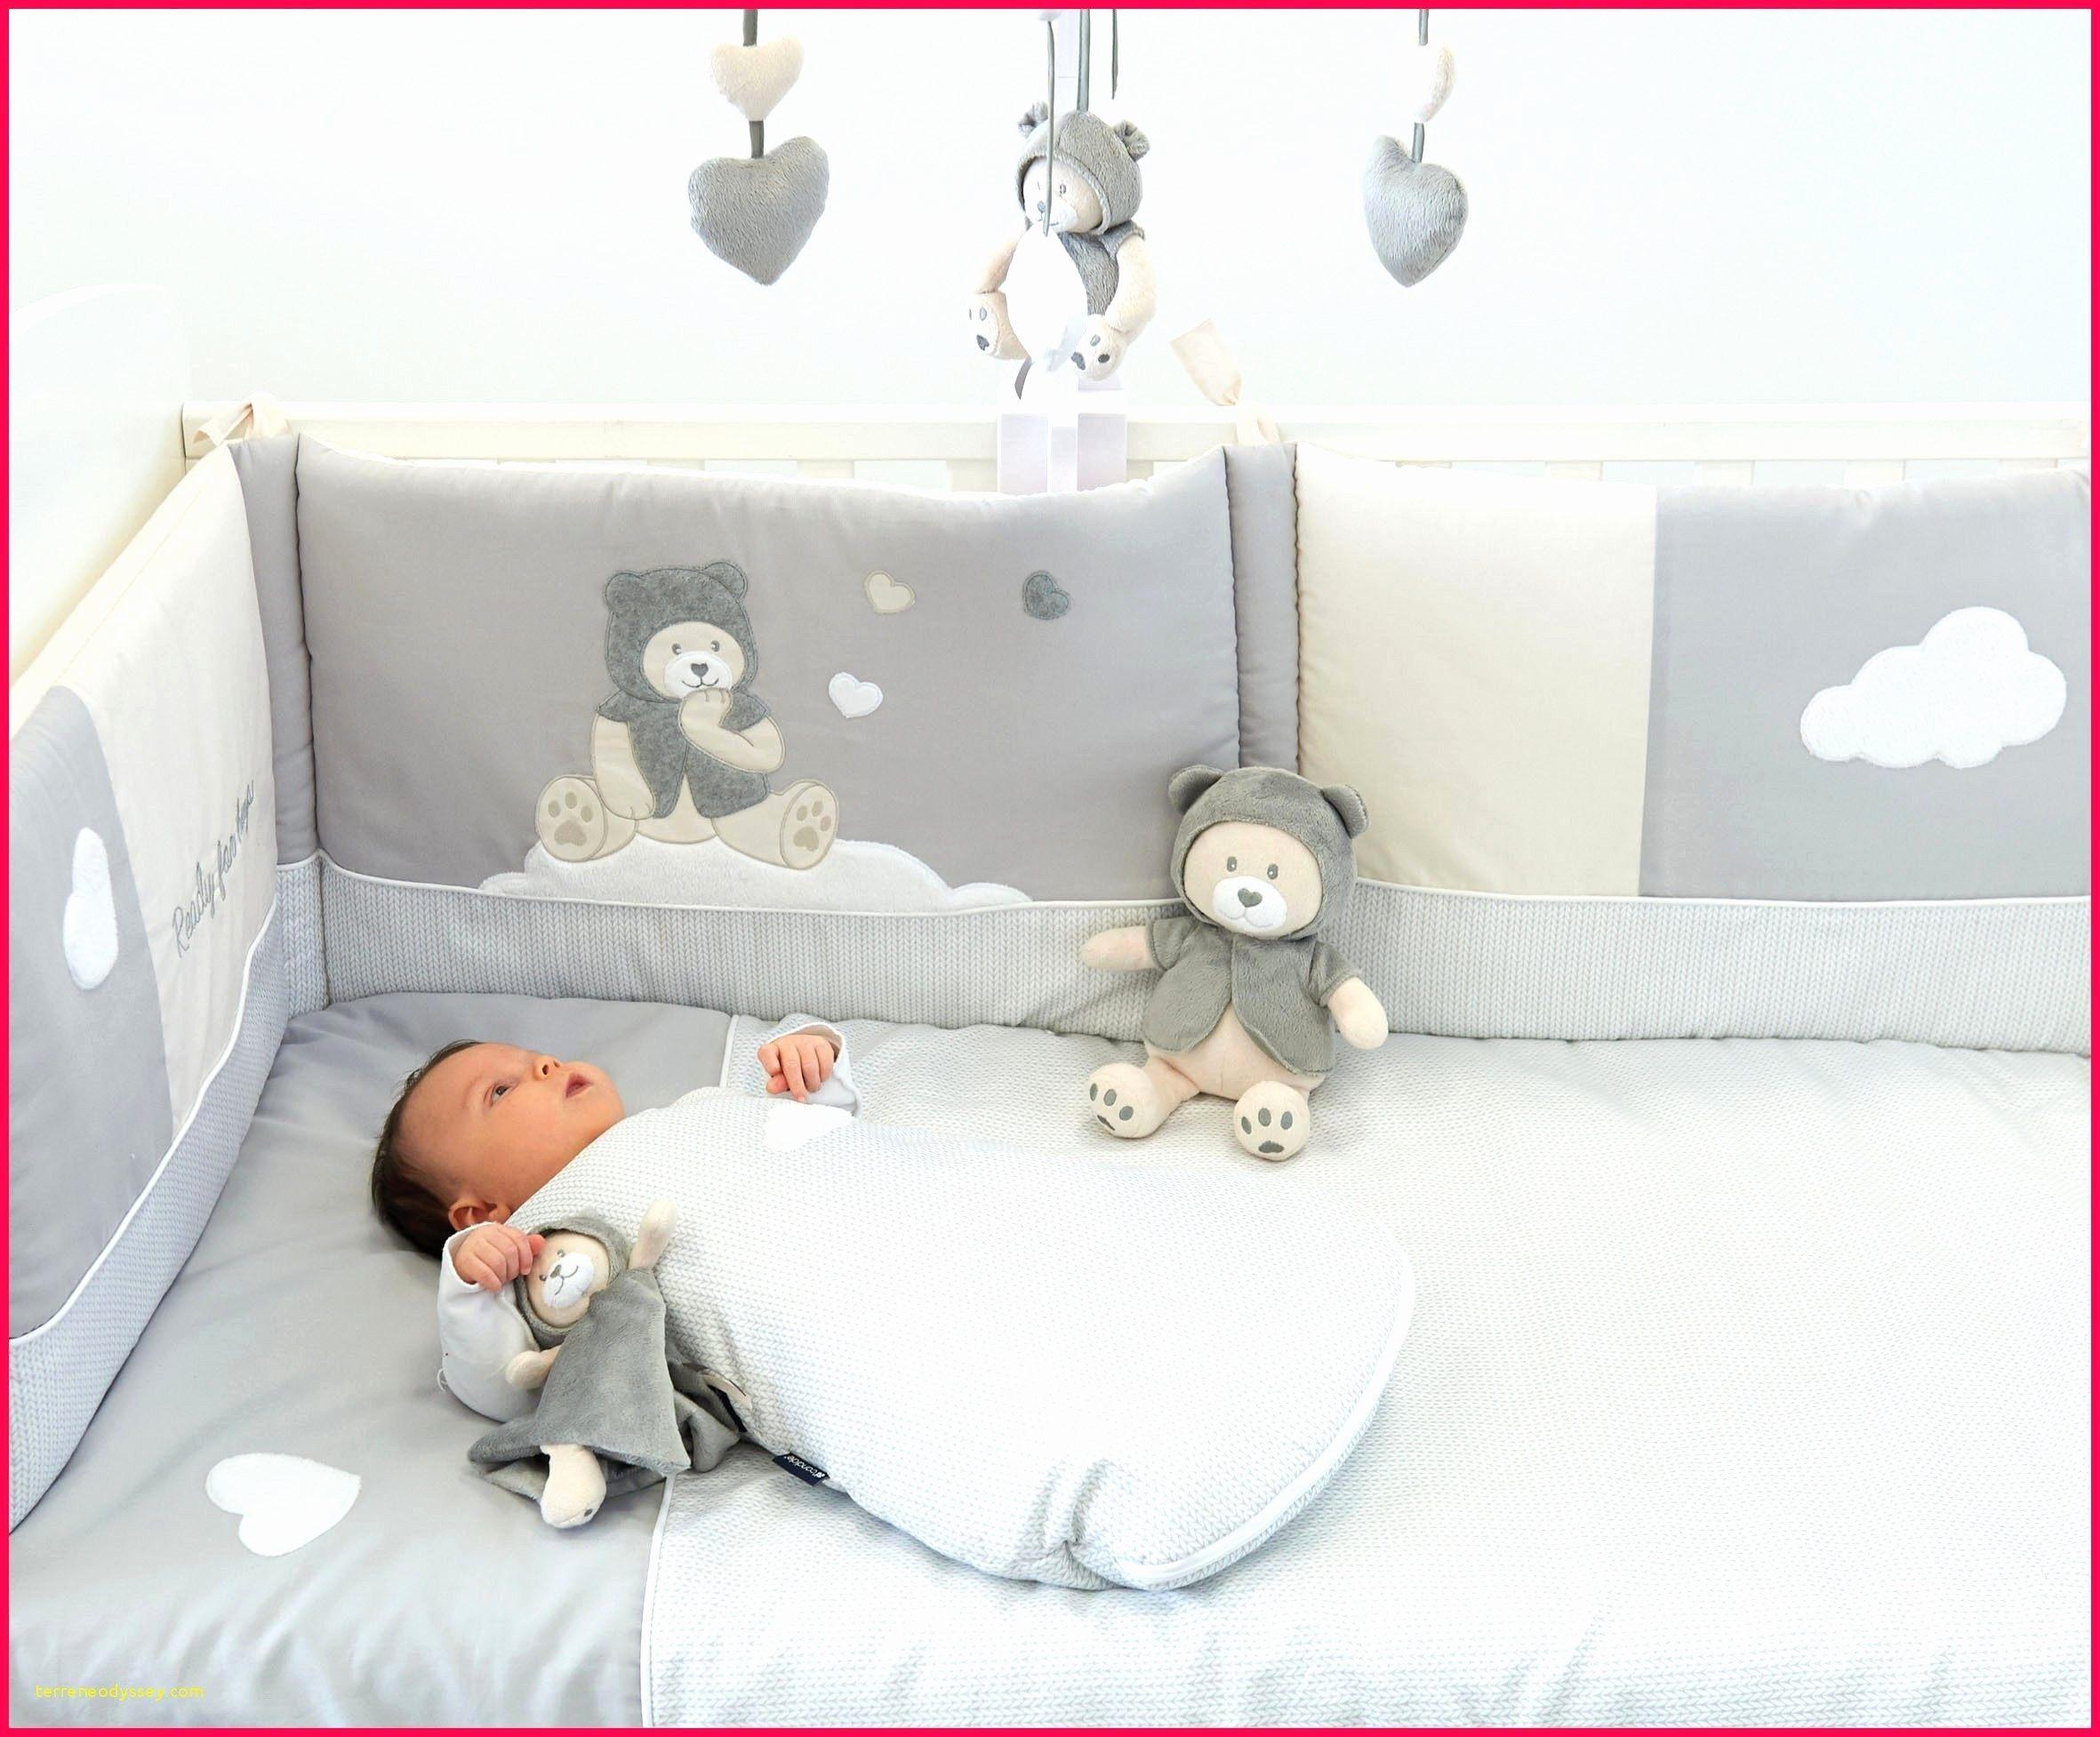 Lit Enfant Evolutif De Luxe Lit Evolutif Avec Matelas Impressionnant Lit Bebe Evolutif Avec